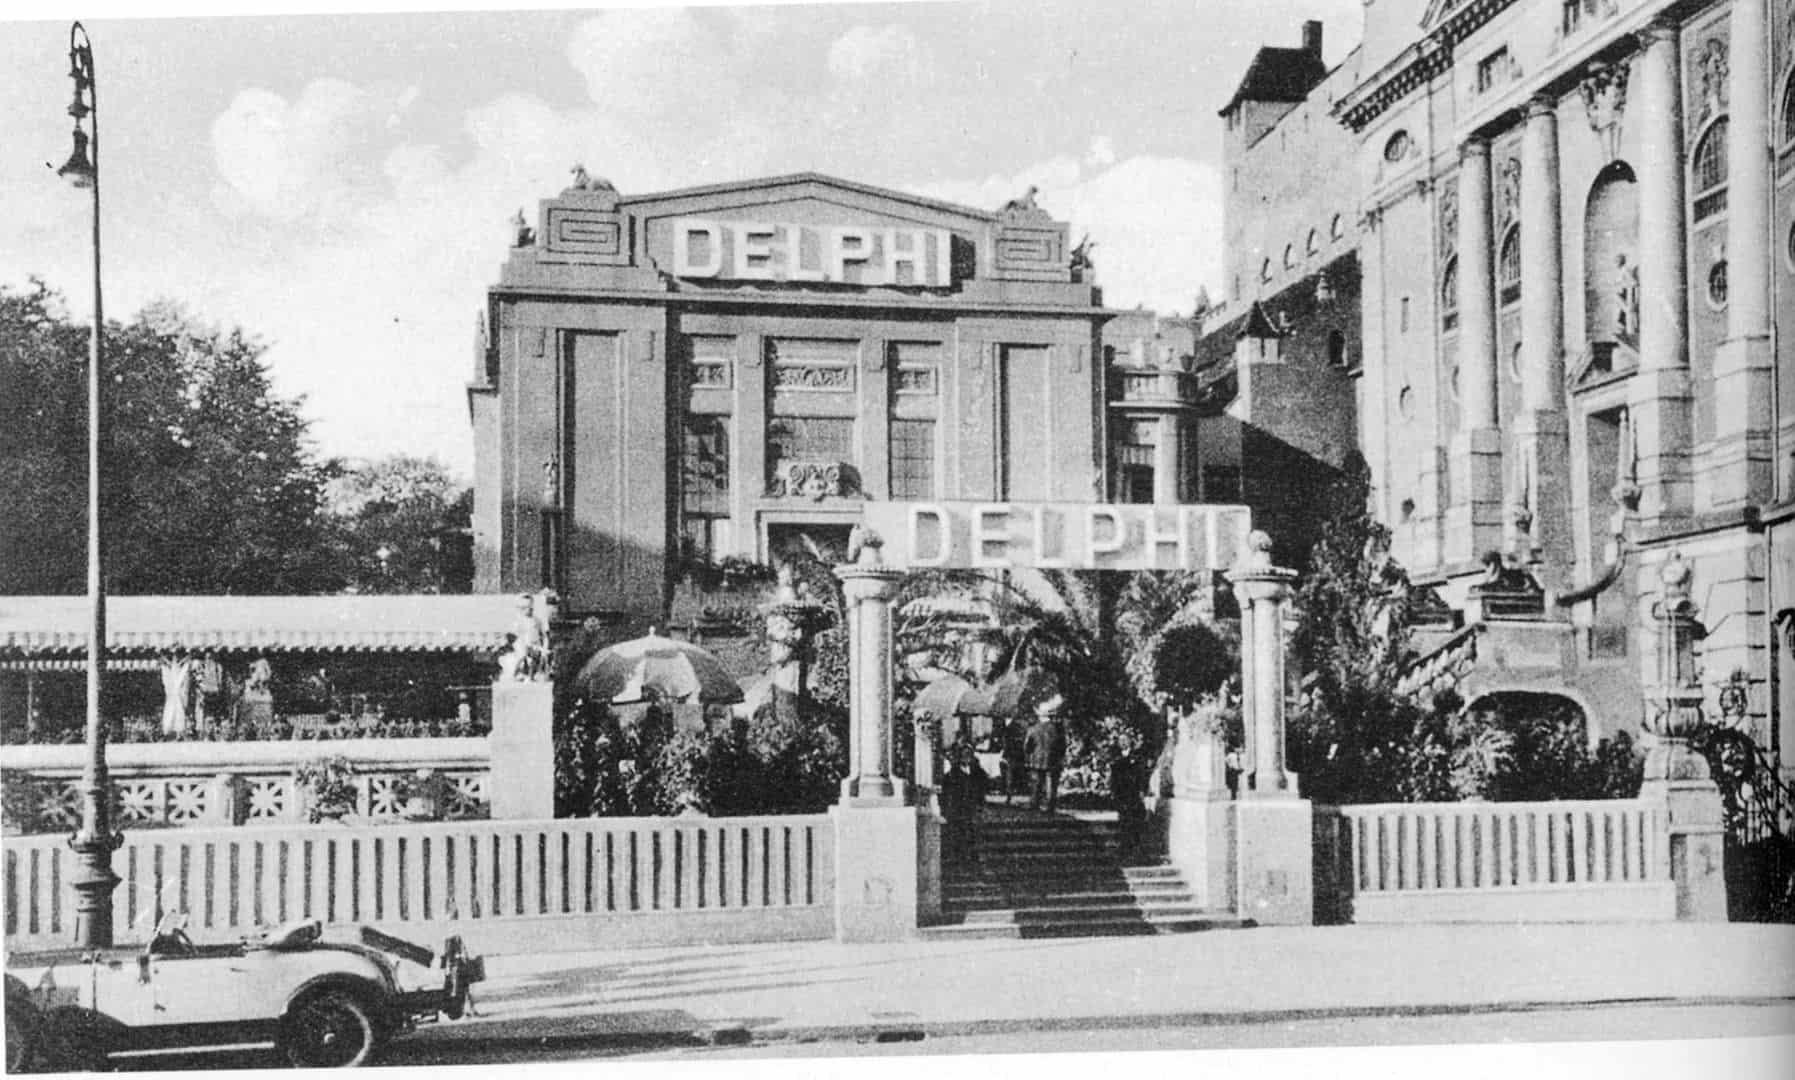 Eingang zum Delphi